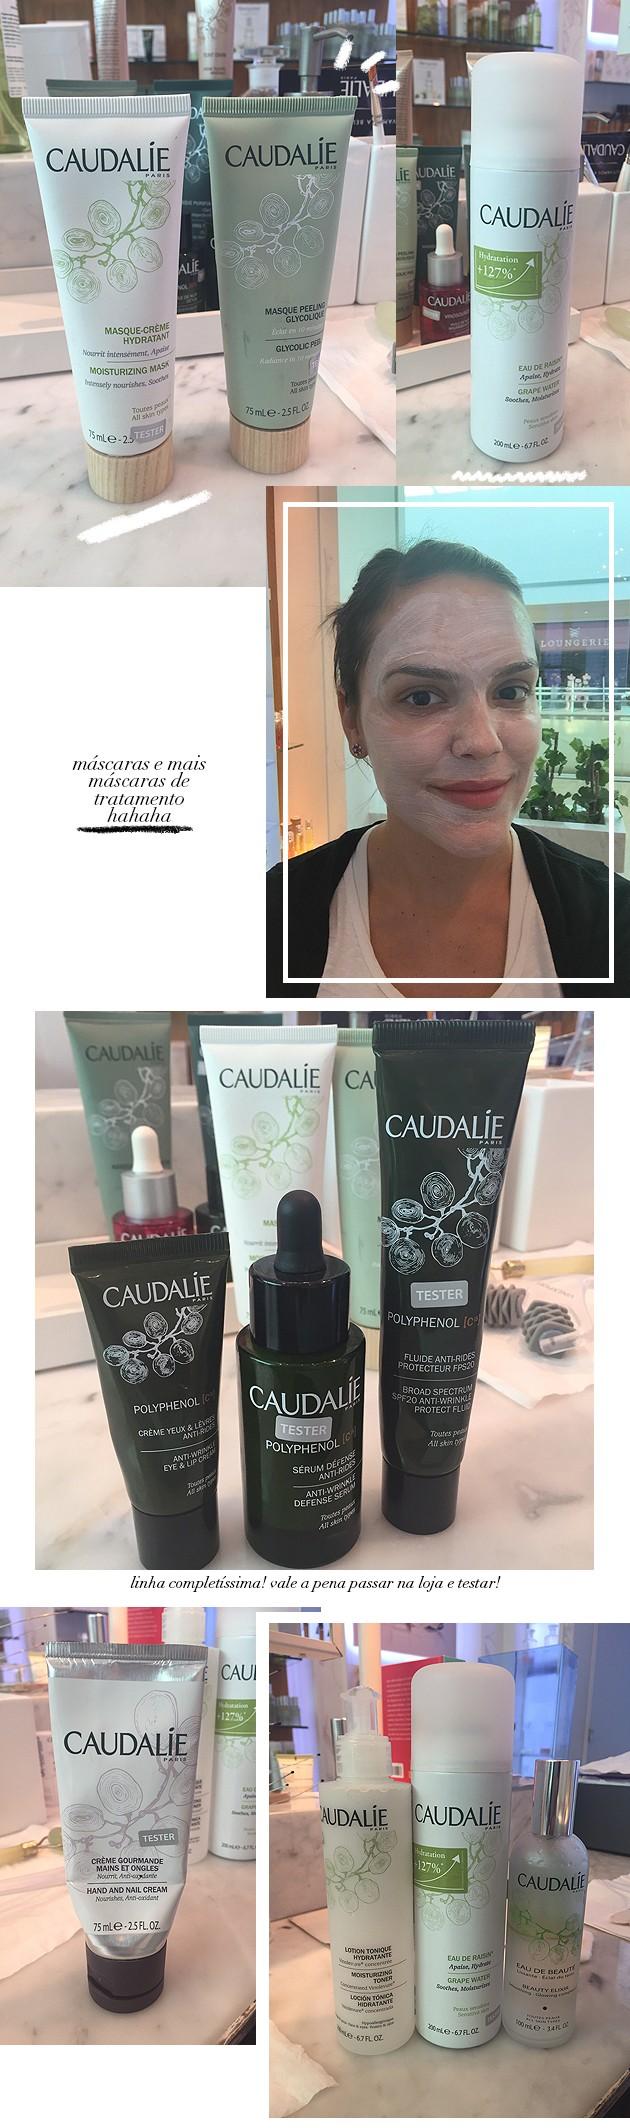 caudalié marca de beleza tudo sobre onde comprar VillageMall blog Lari Duarte dicas beauté